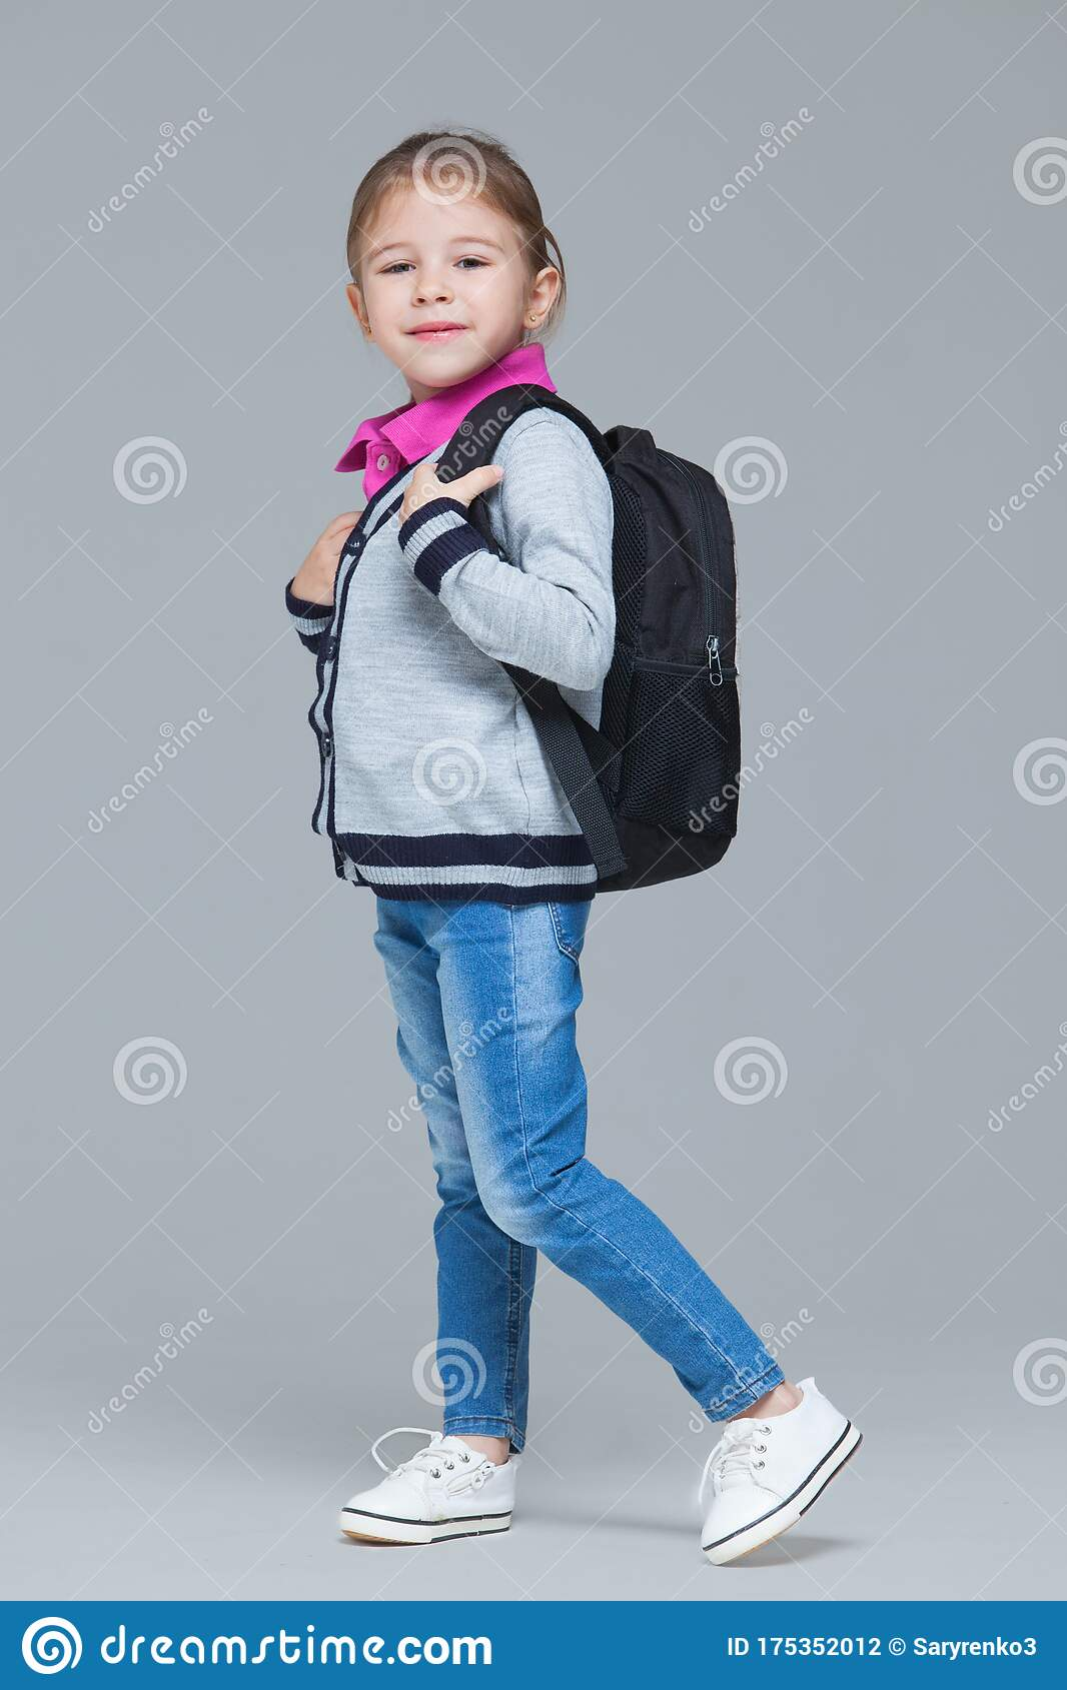 Schoolgirl Uniform Sitting Open Book Pencil Stock Photo